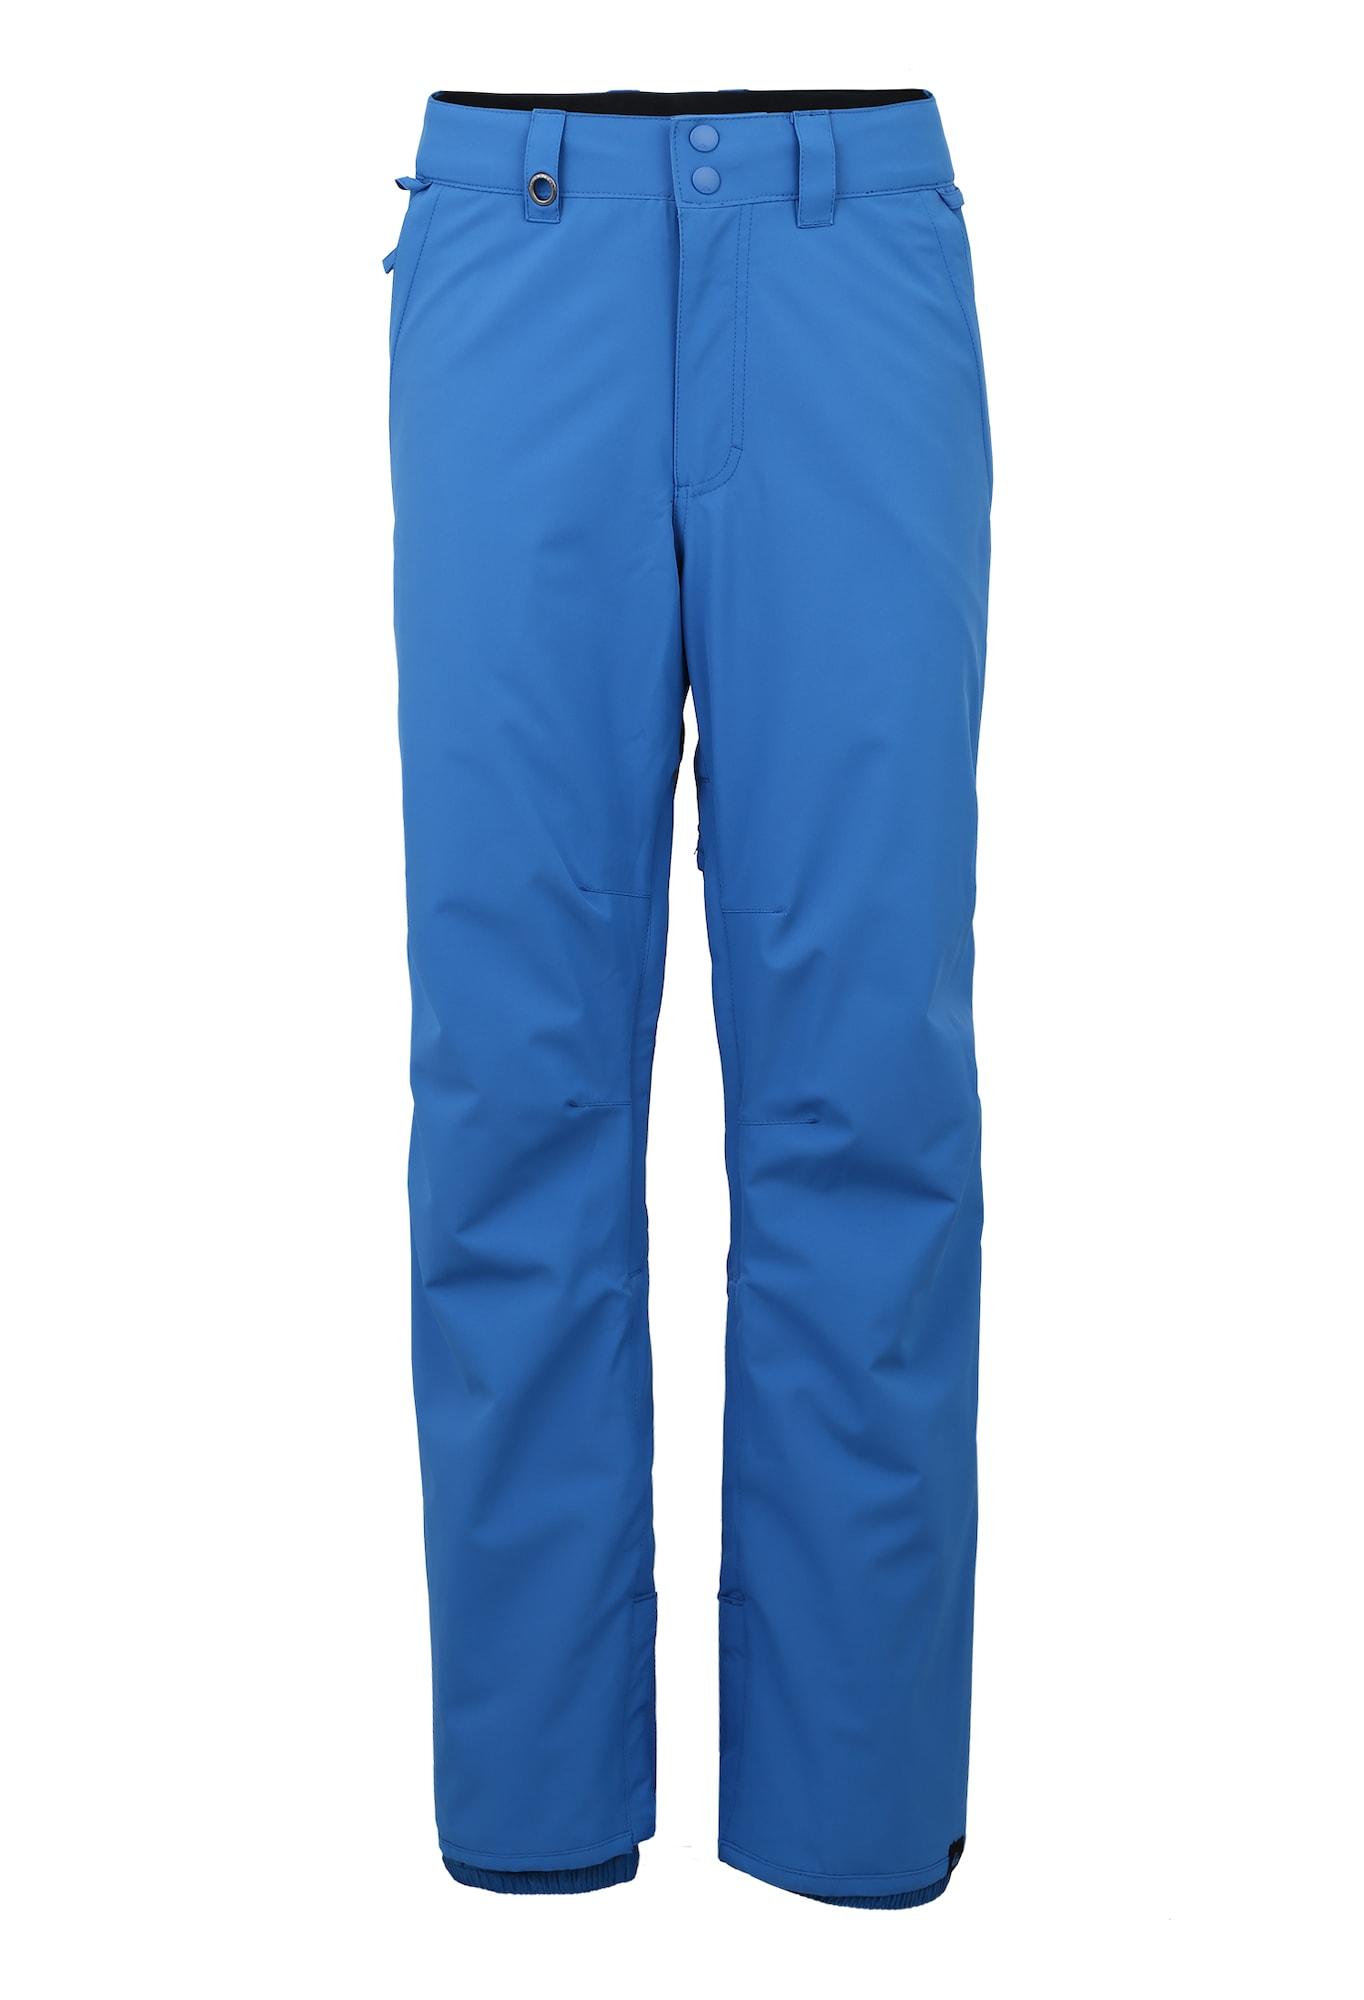 Outdoorové kalhoty ESTATE PT M SNPT BQC0 modrá QUIKSILVER